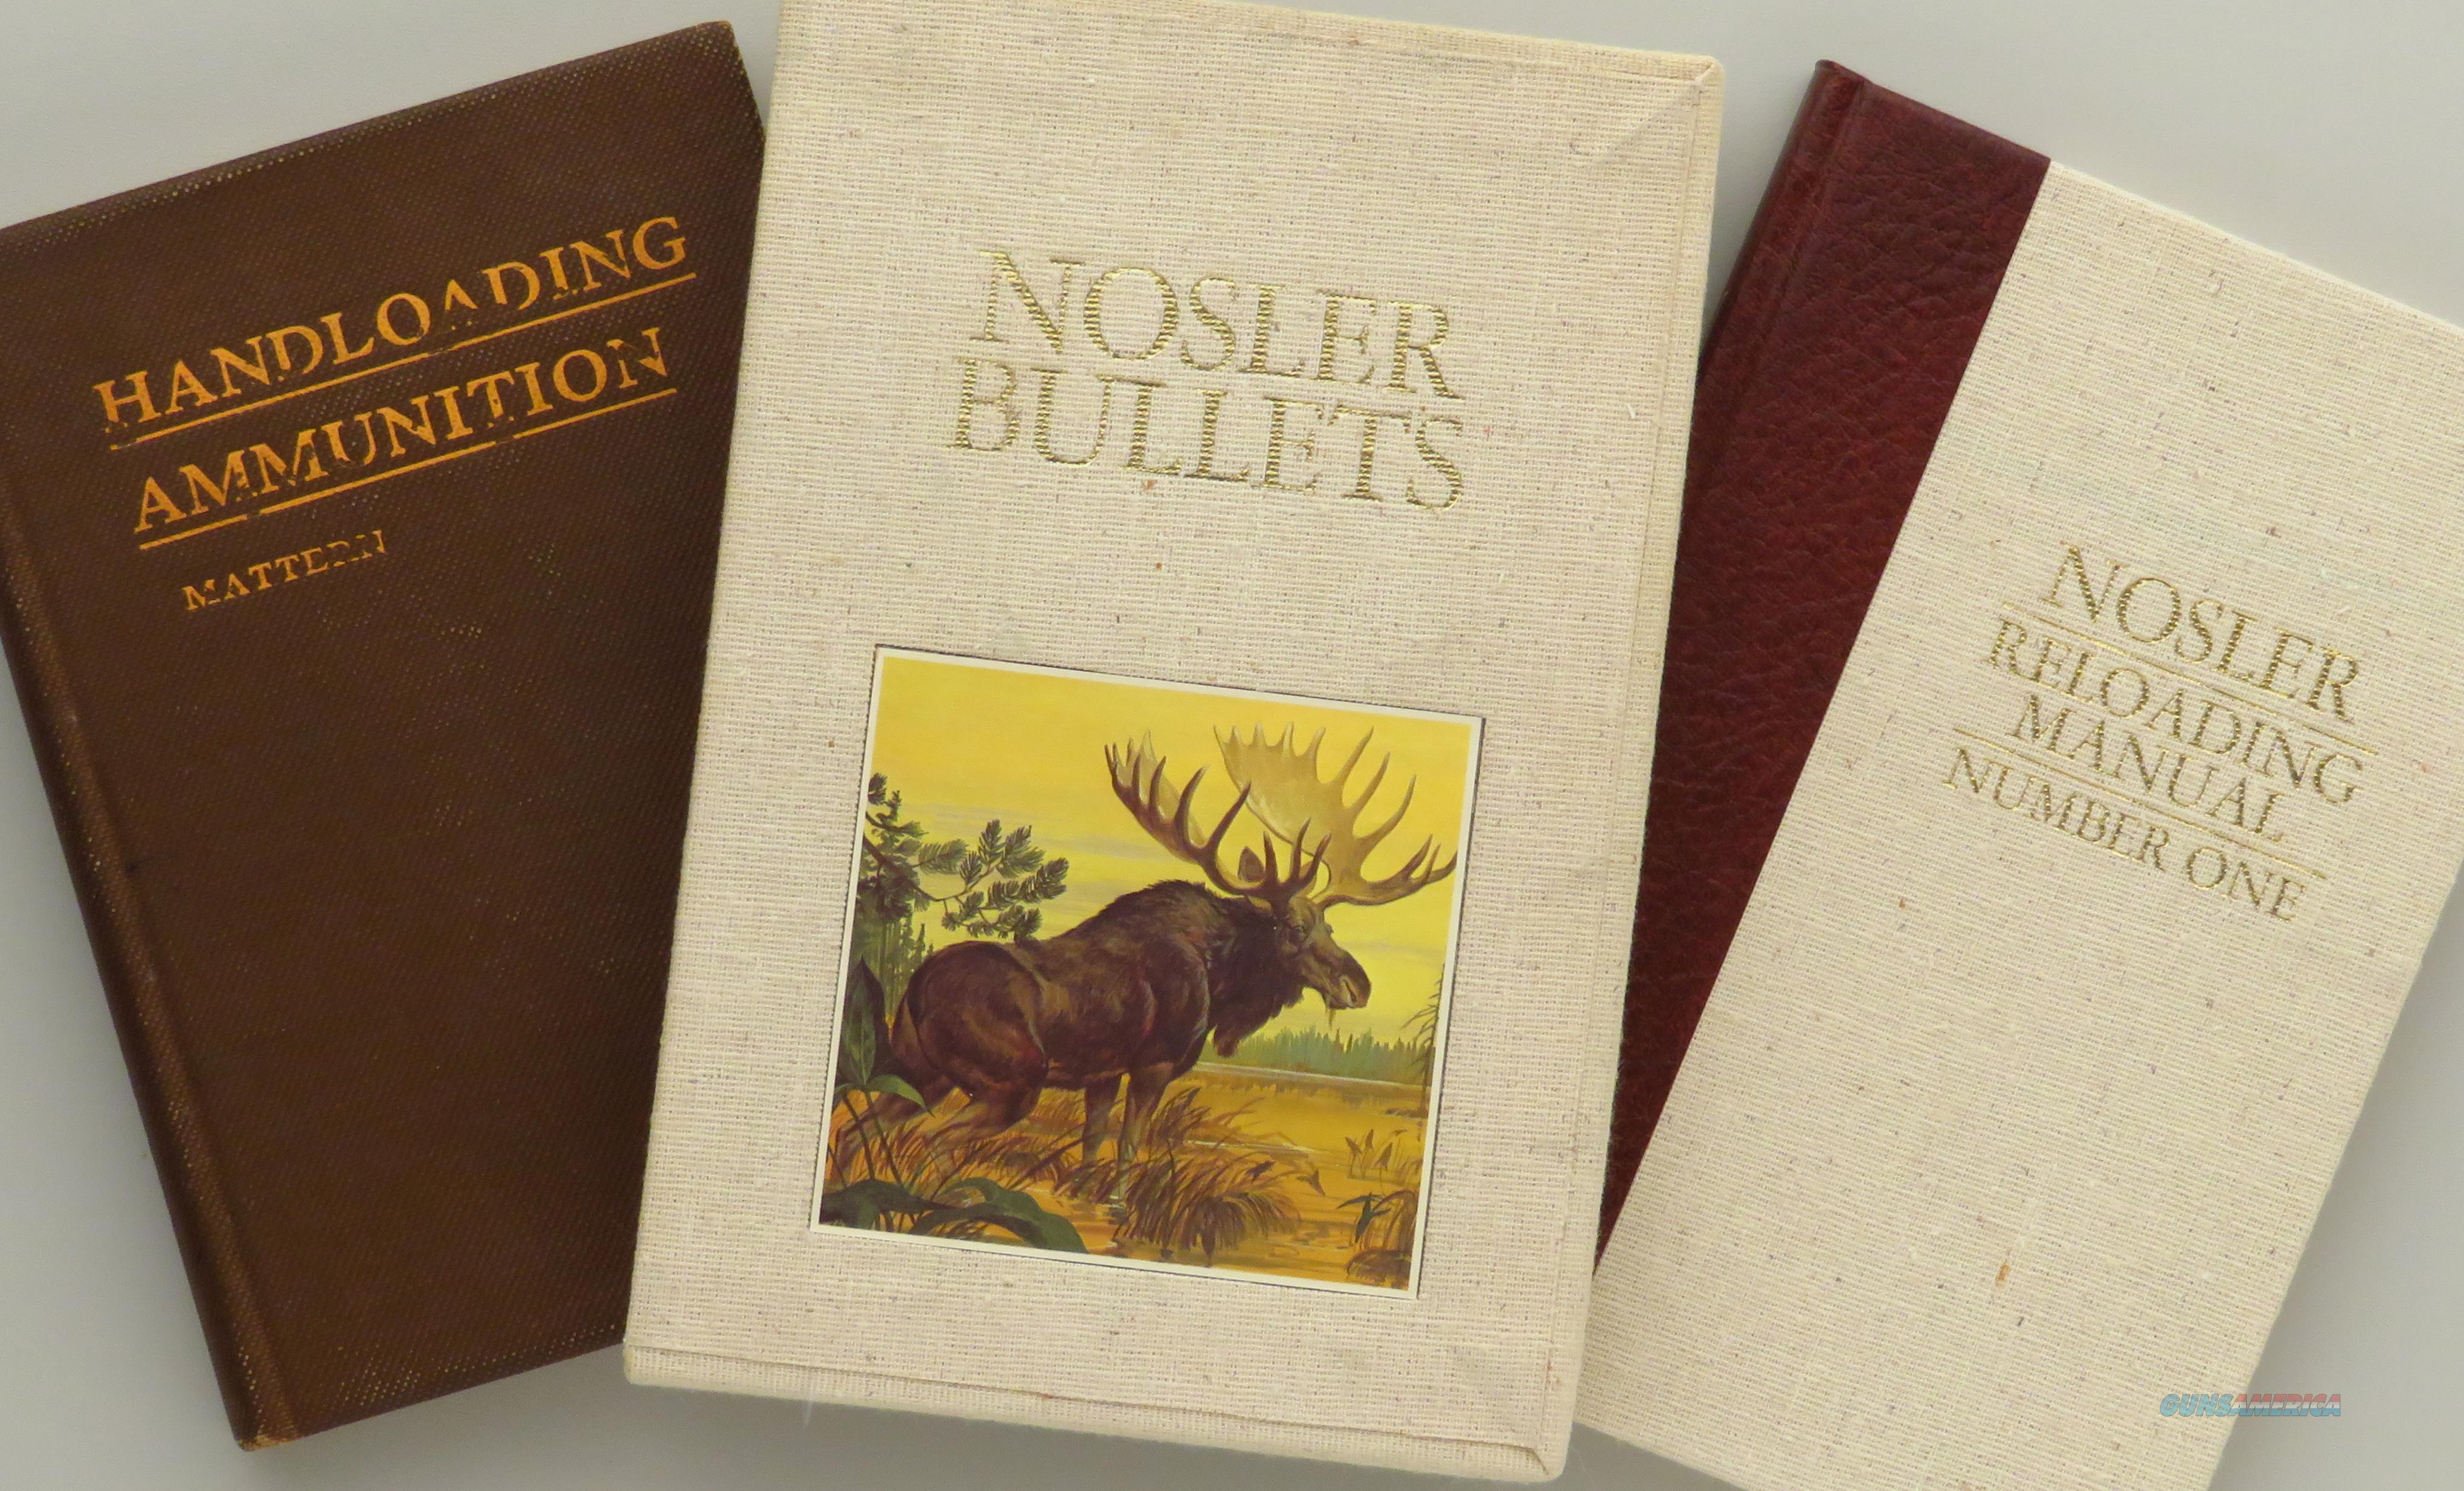 Nosler Reloading Manual Number One, 1976, linen and slip, signed, plus Handloading Ammunition by Mattern  Non-Guns > Books & Magazines